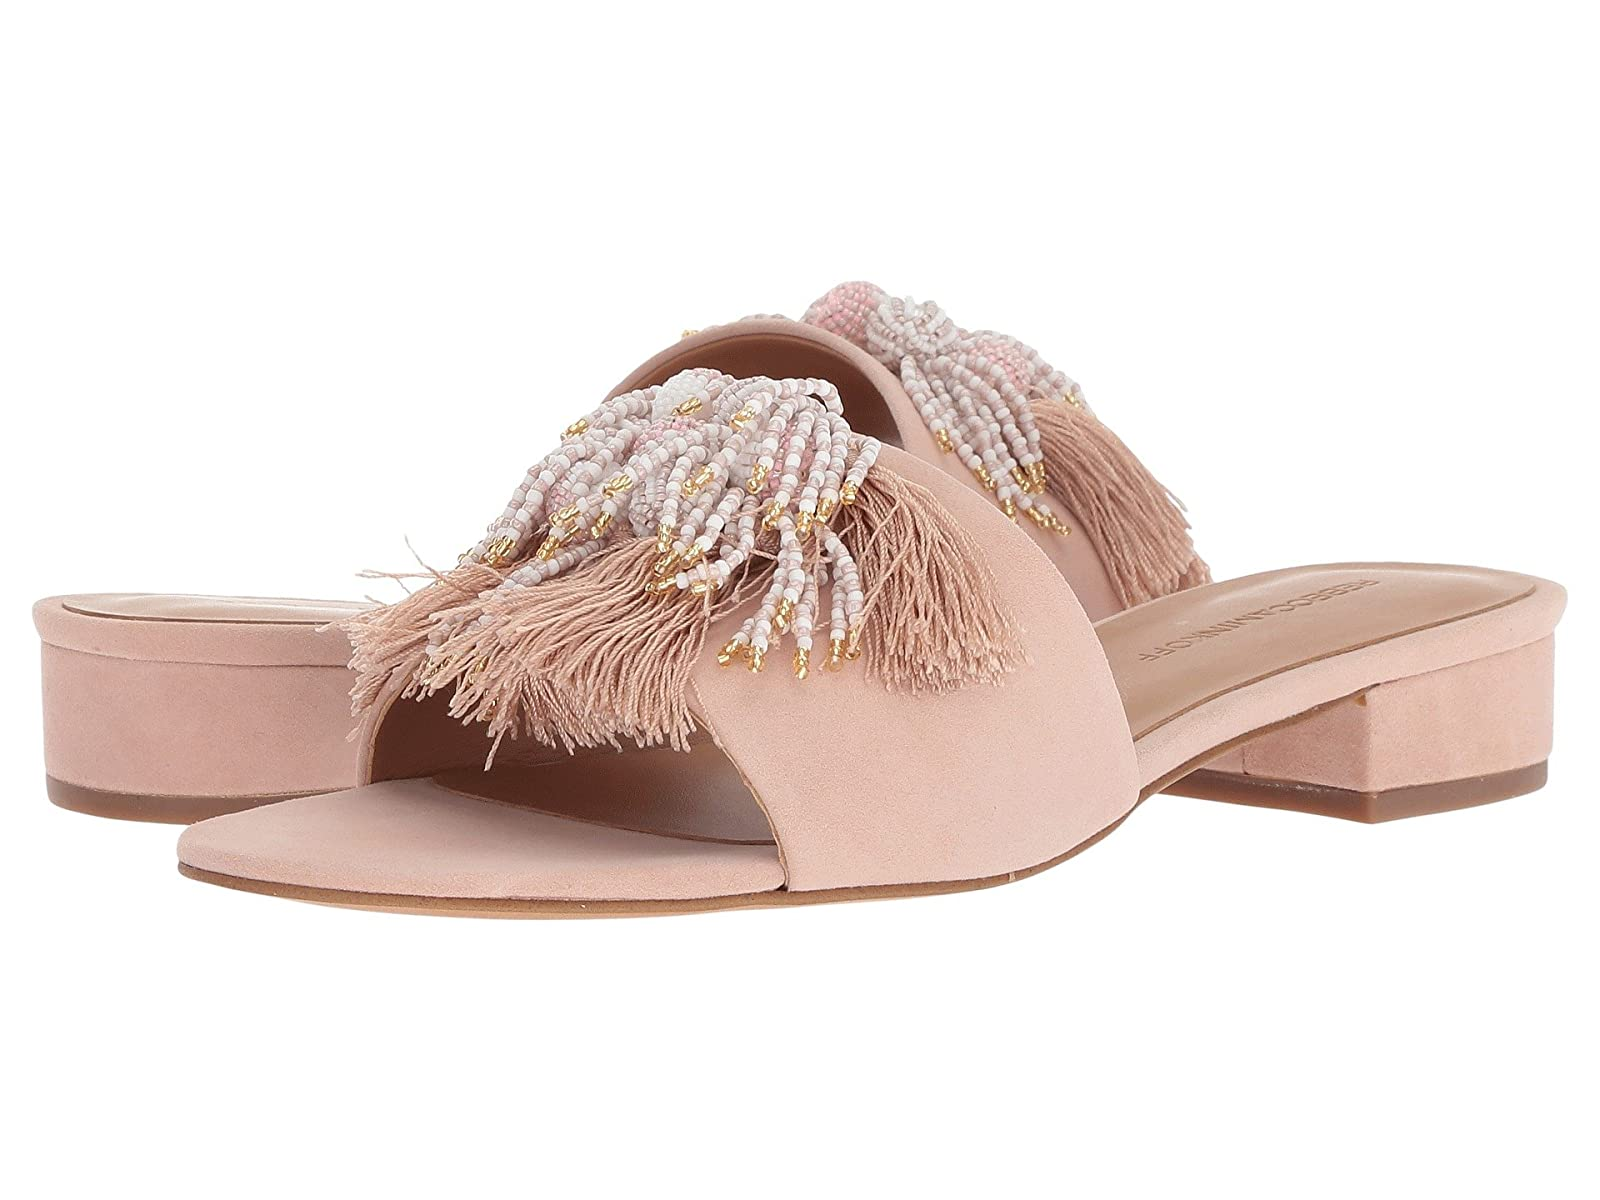 Rebecca Minkoff KayleighAtmospheric grades have affordable shoes